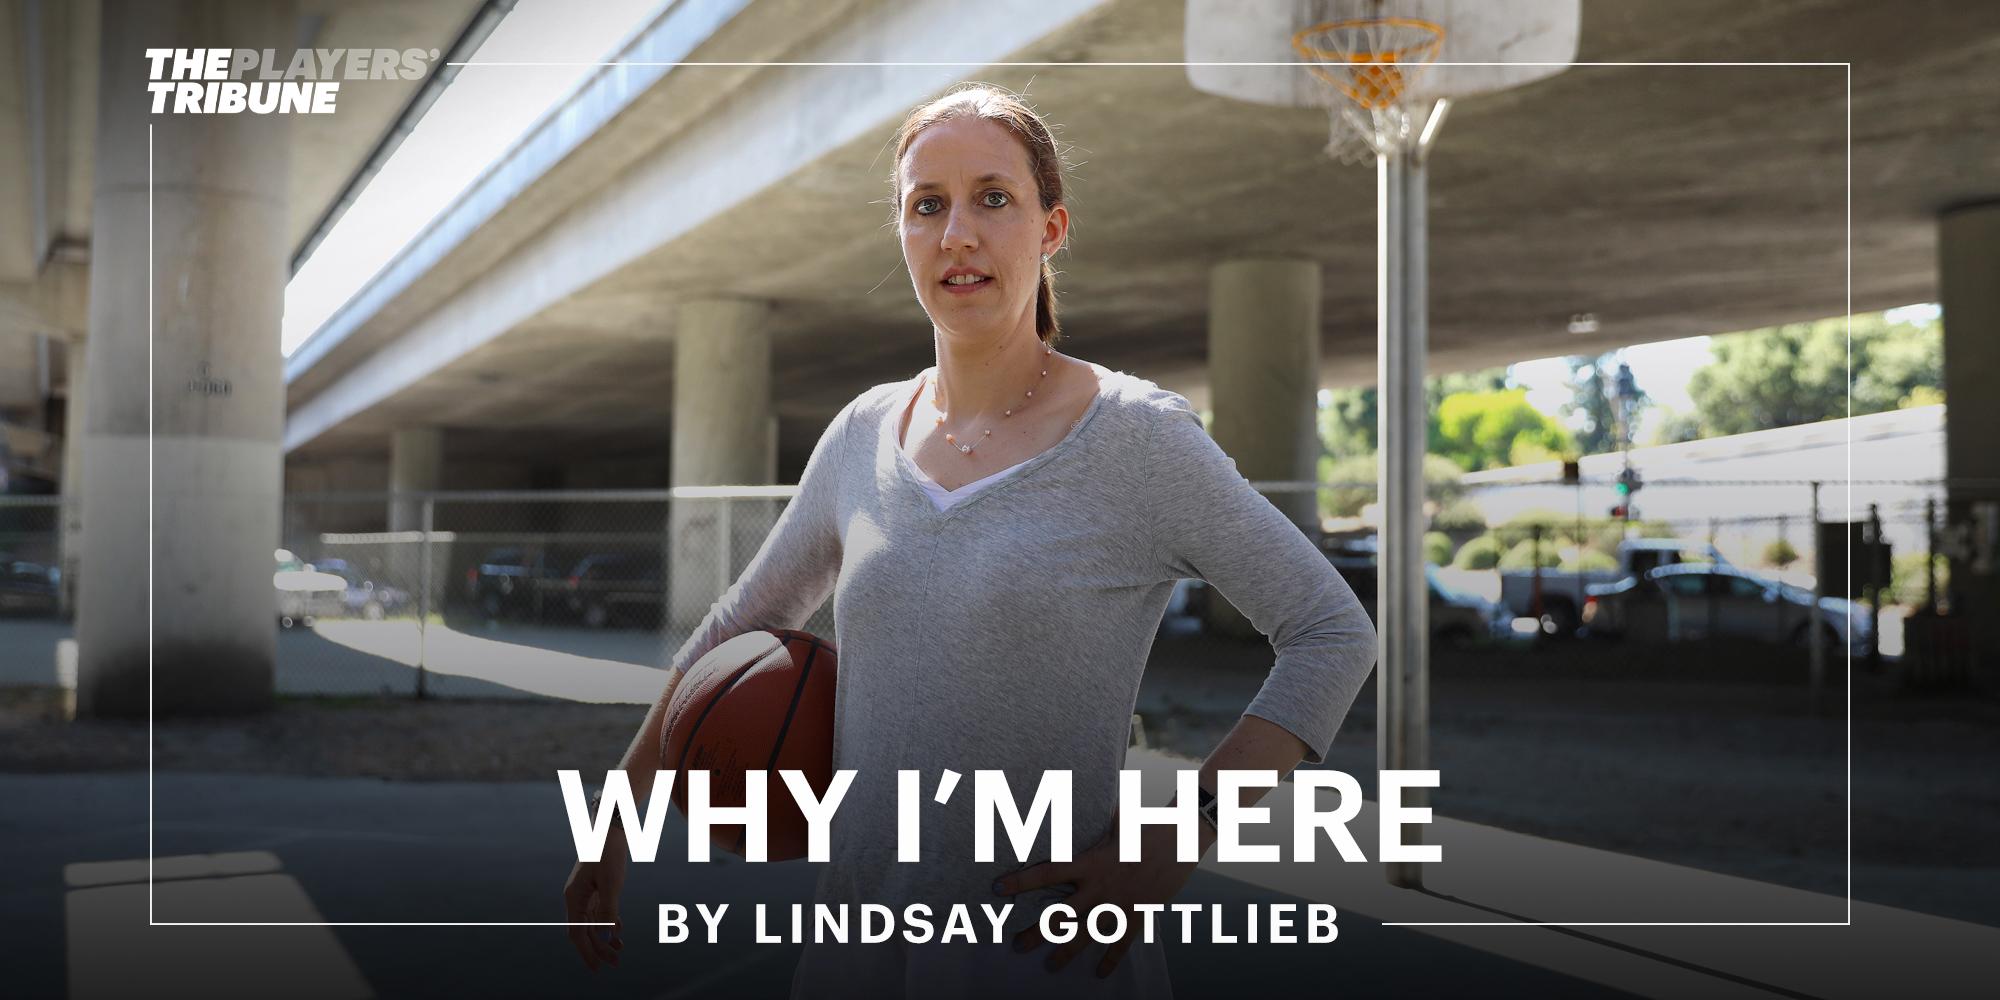 Lindsay Gottlieb cleveland, cavaliers, coach, nba, lindsay, gottlieb, cal, female, women empowerment, basketball